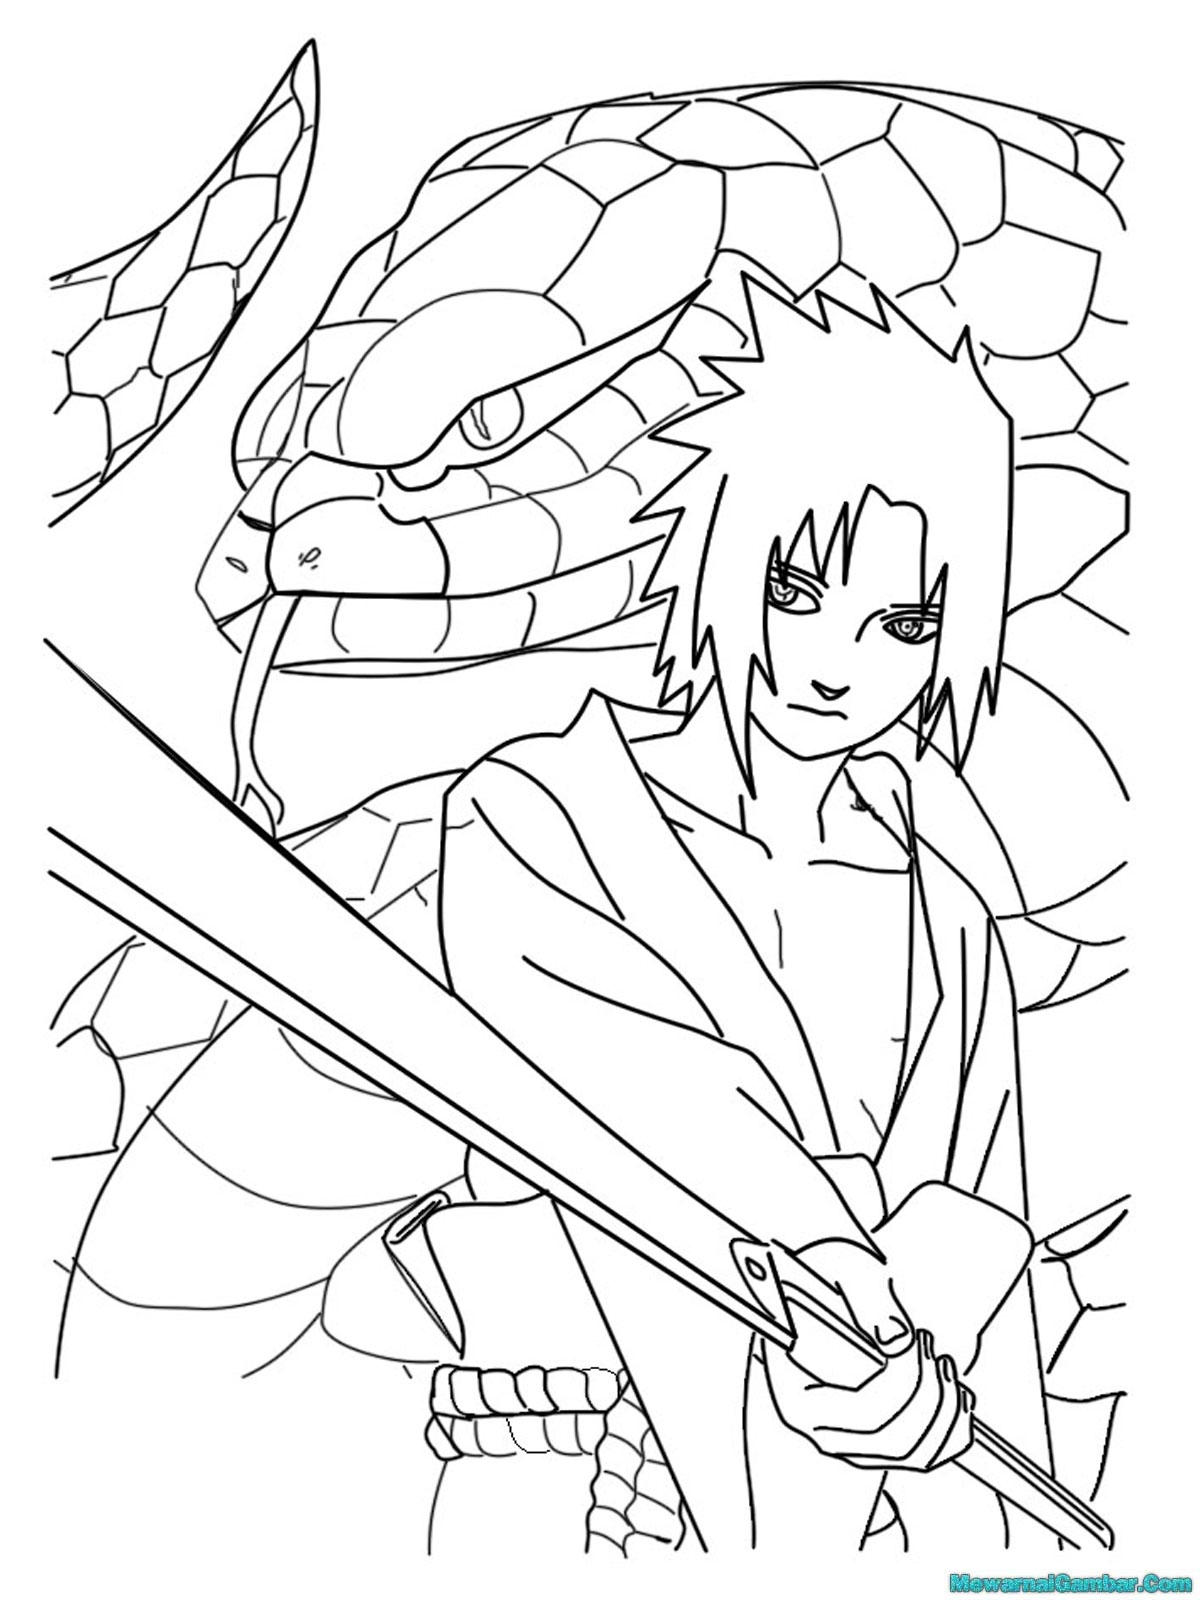 Mewarnai Gambar Sasuke